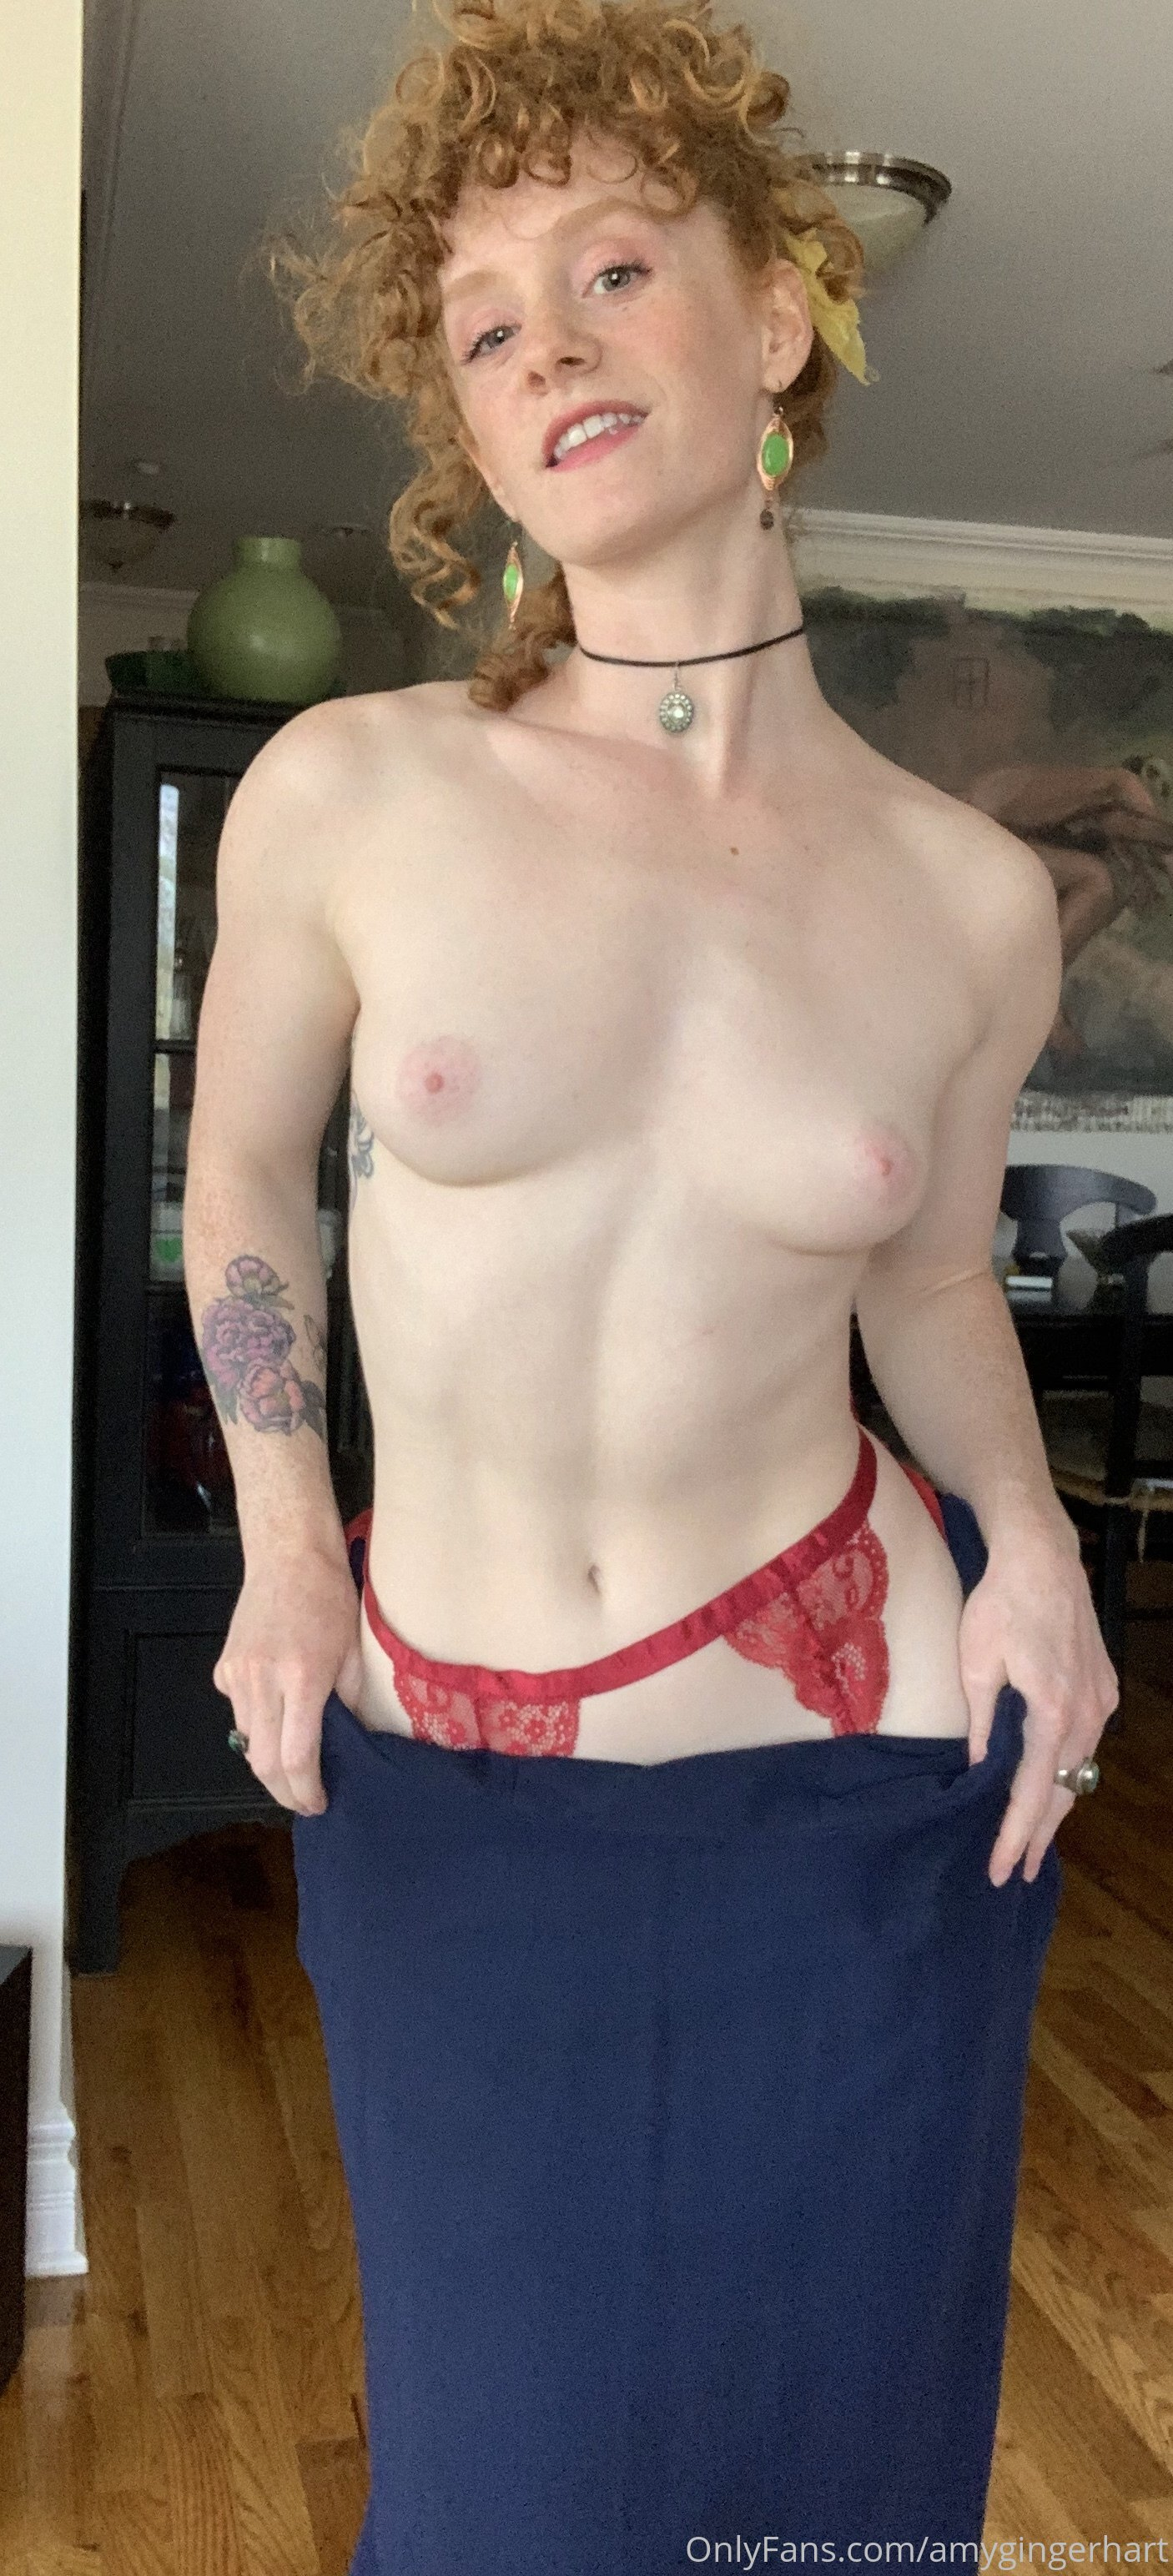 Amy Hart, Amygingerhart, Onlyfans 0155